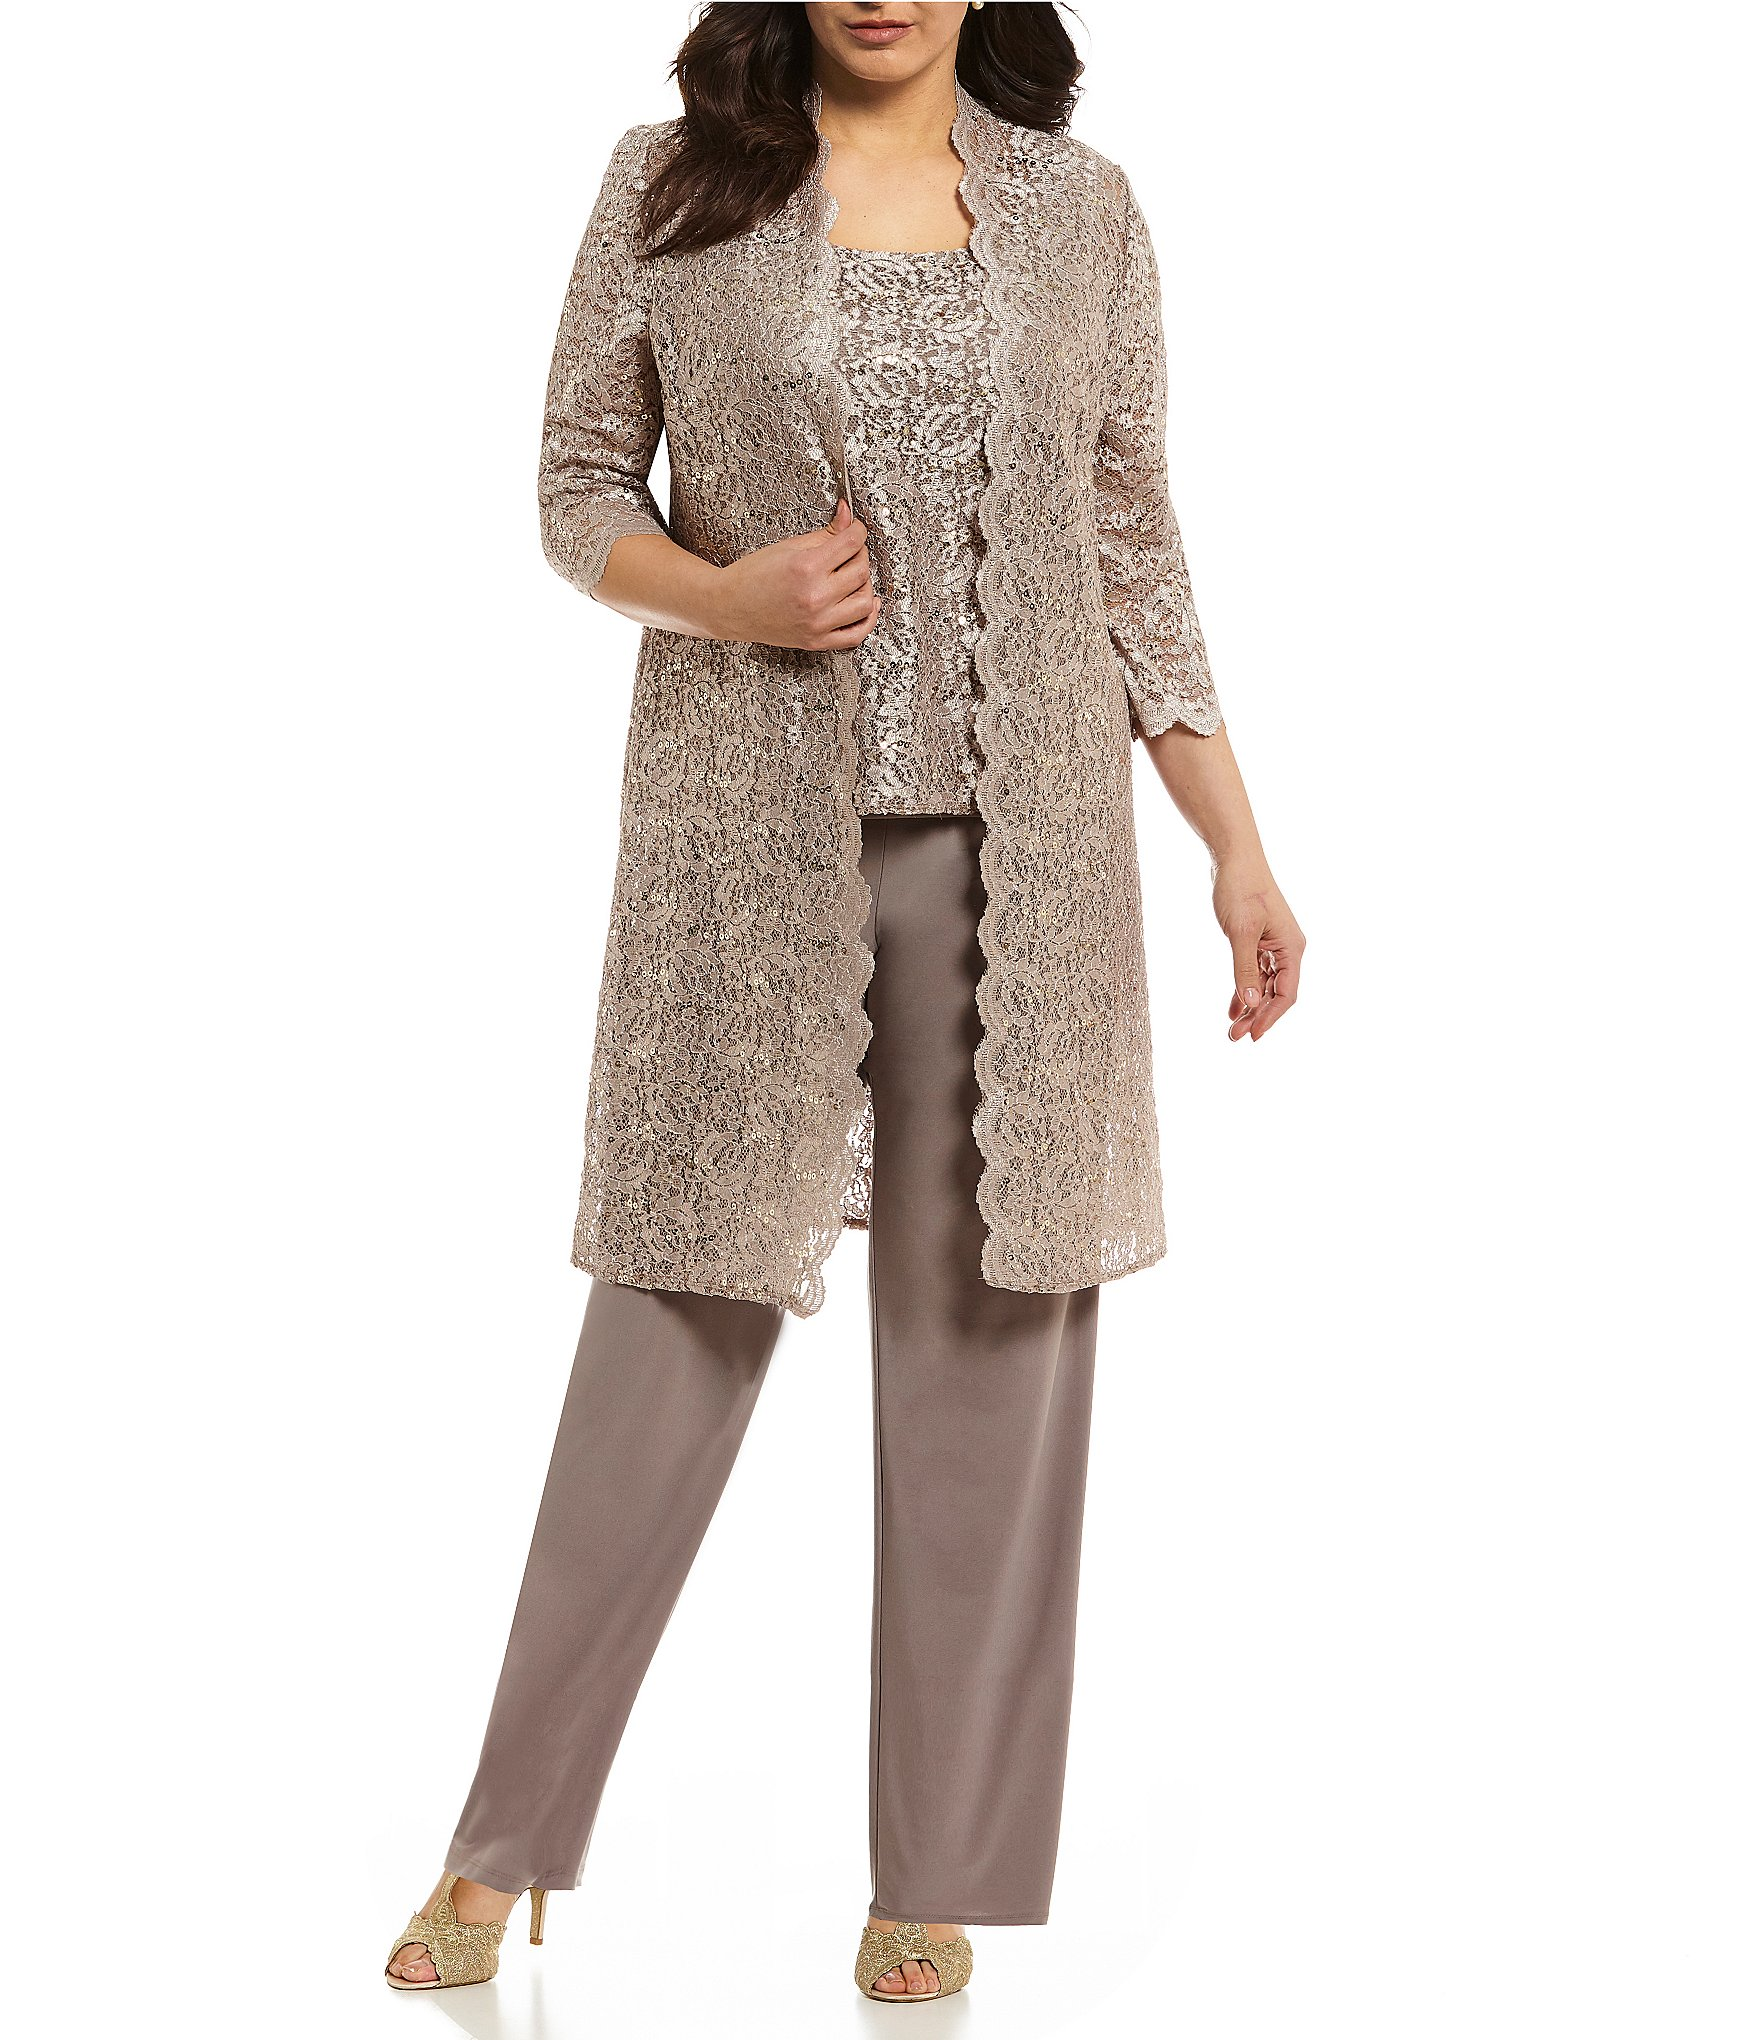 Evening Pant Suits For 50 | elegant evening pant suits